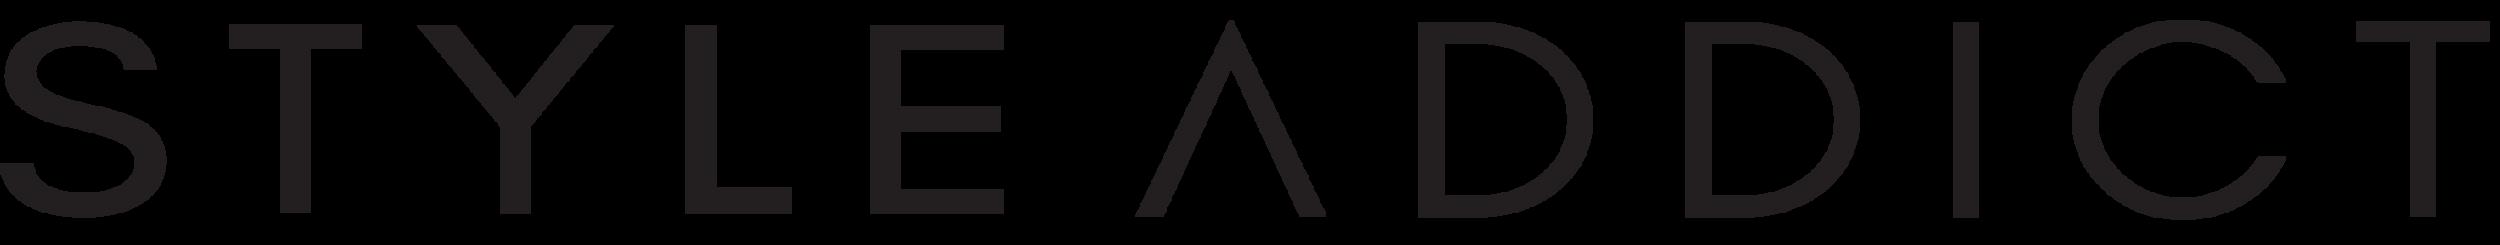 Style_Addict_logo_final_black.png